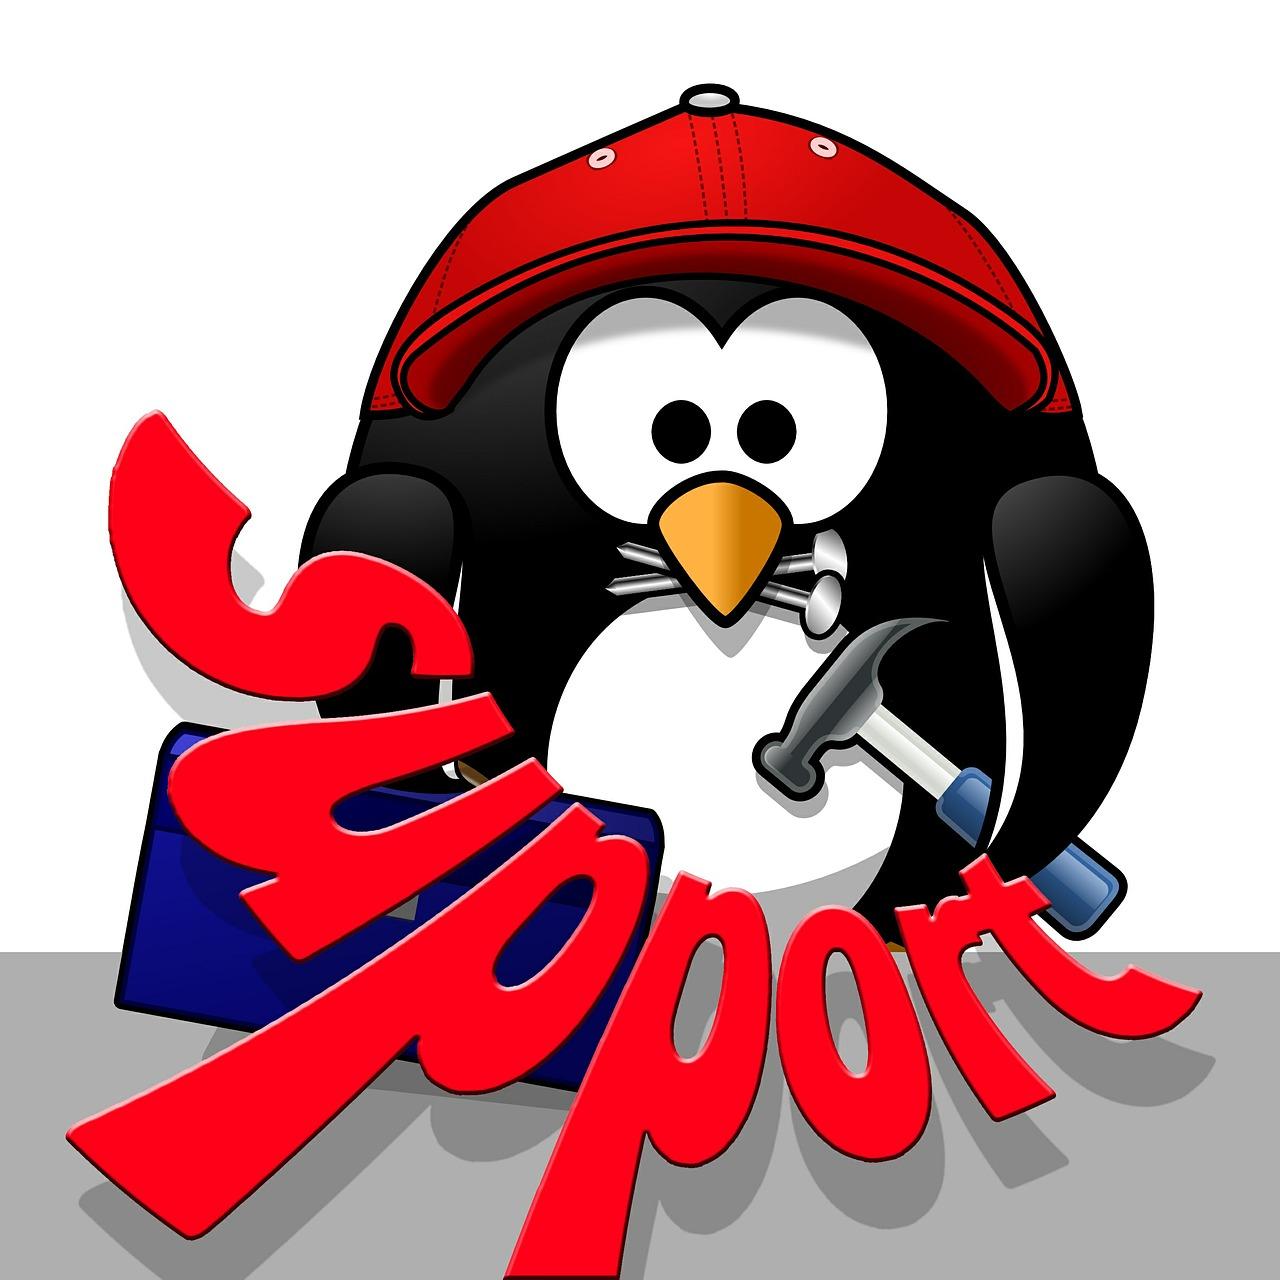 penguin-4